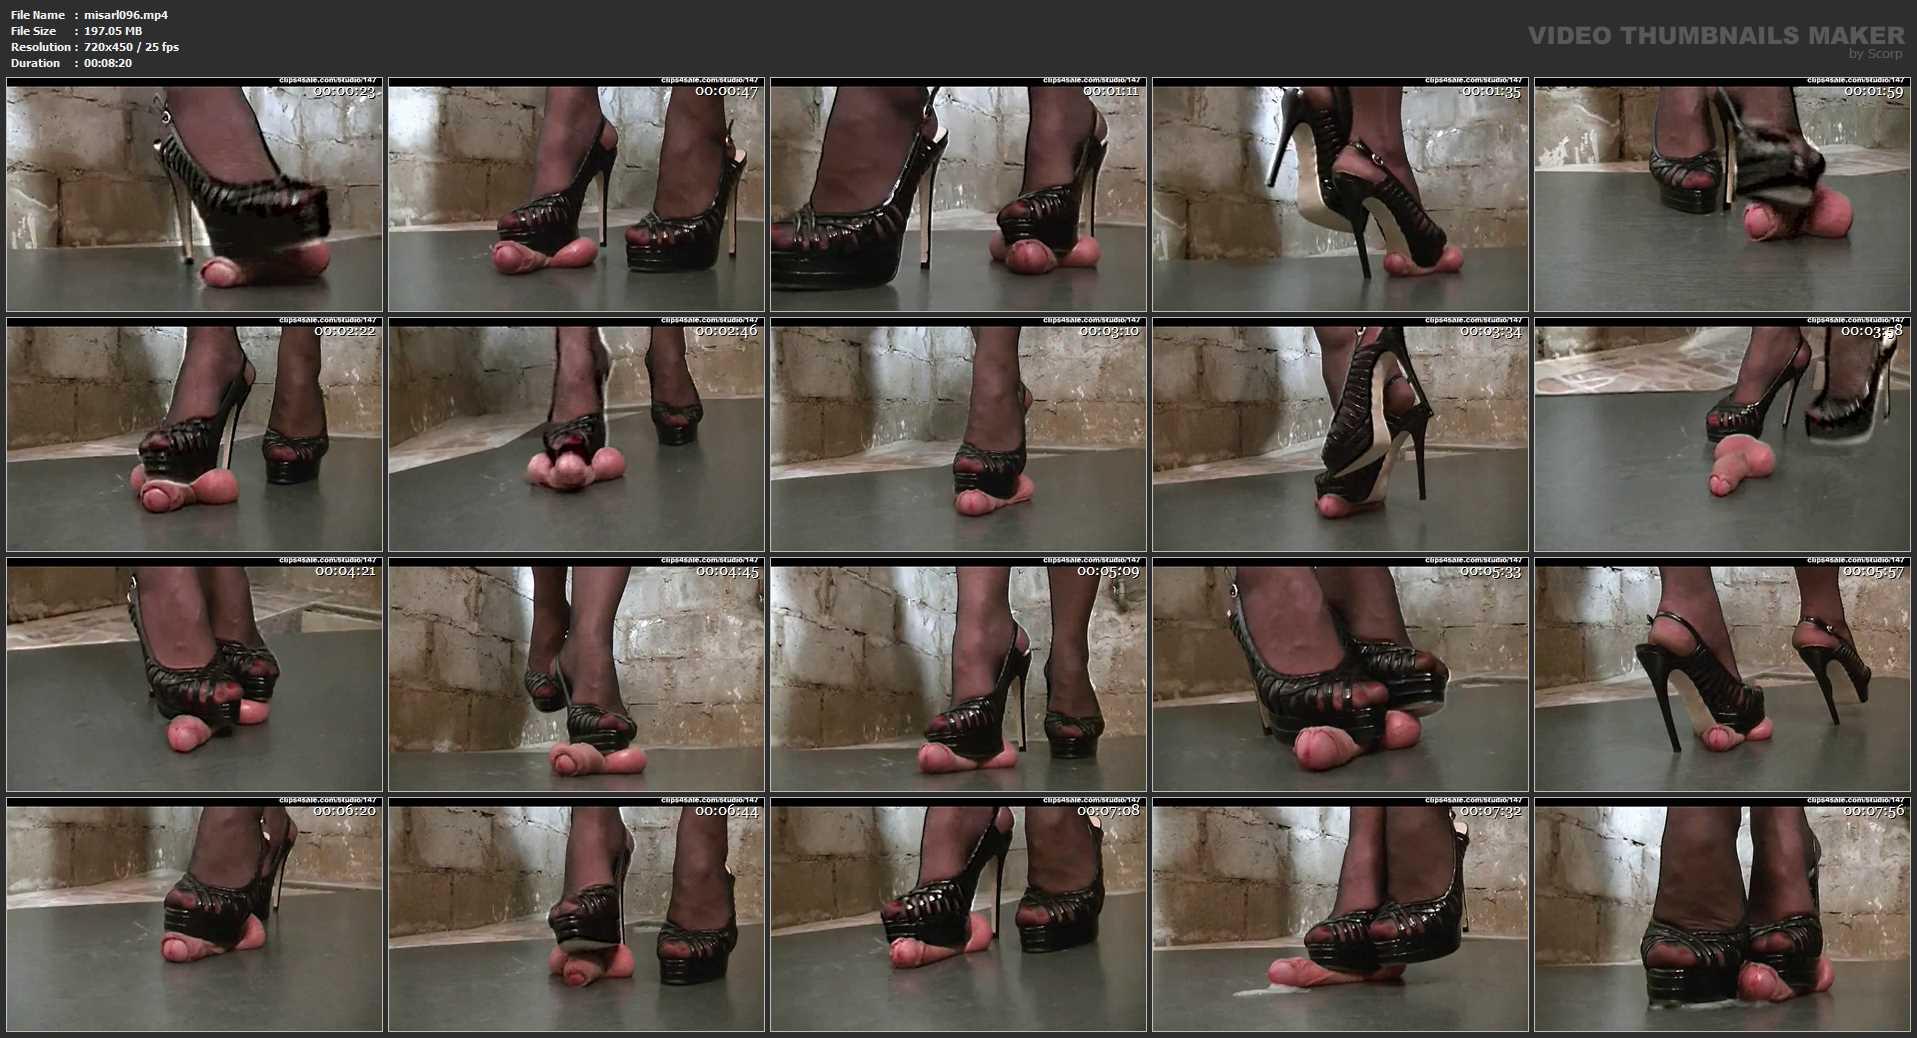 Mistress Arletta In Scene: IN THE CELLAR - A BALLS AND COCK TRAMPLE - SD/450p/MP4